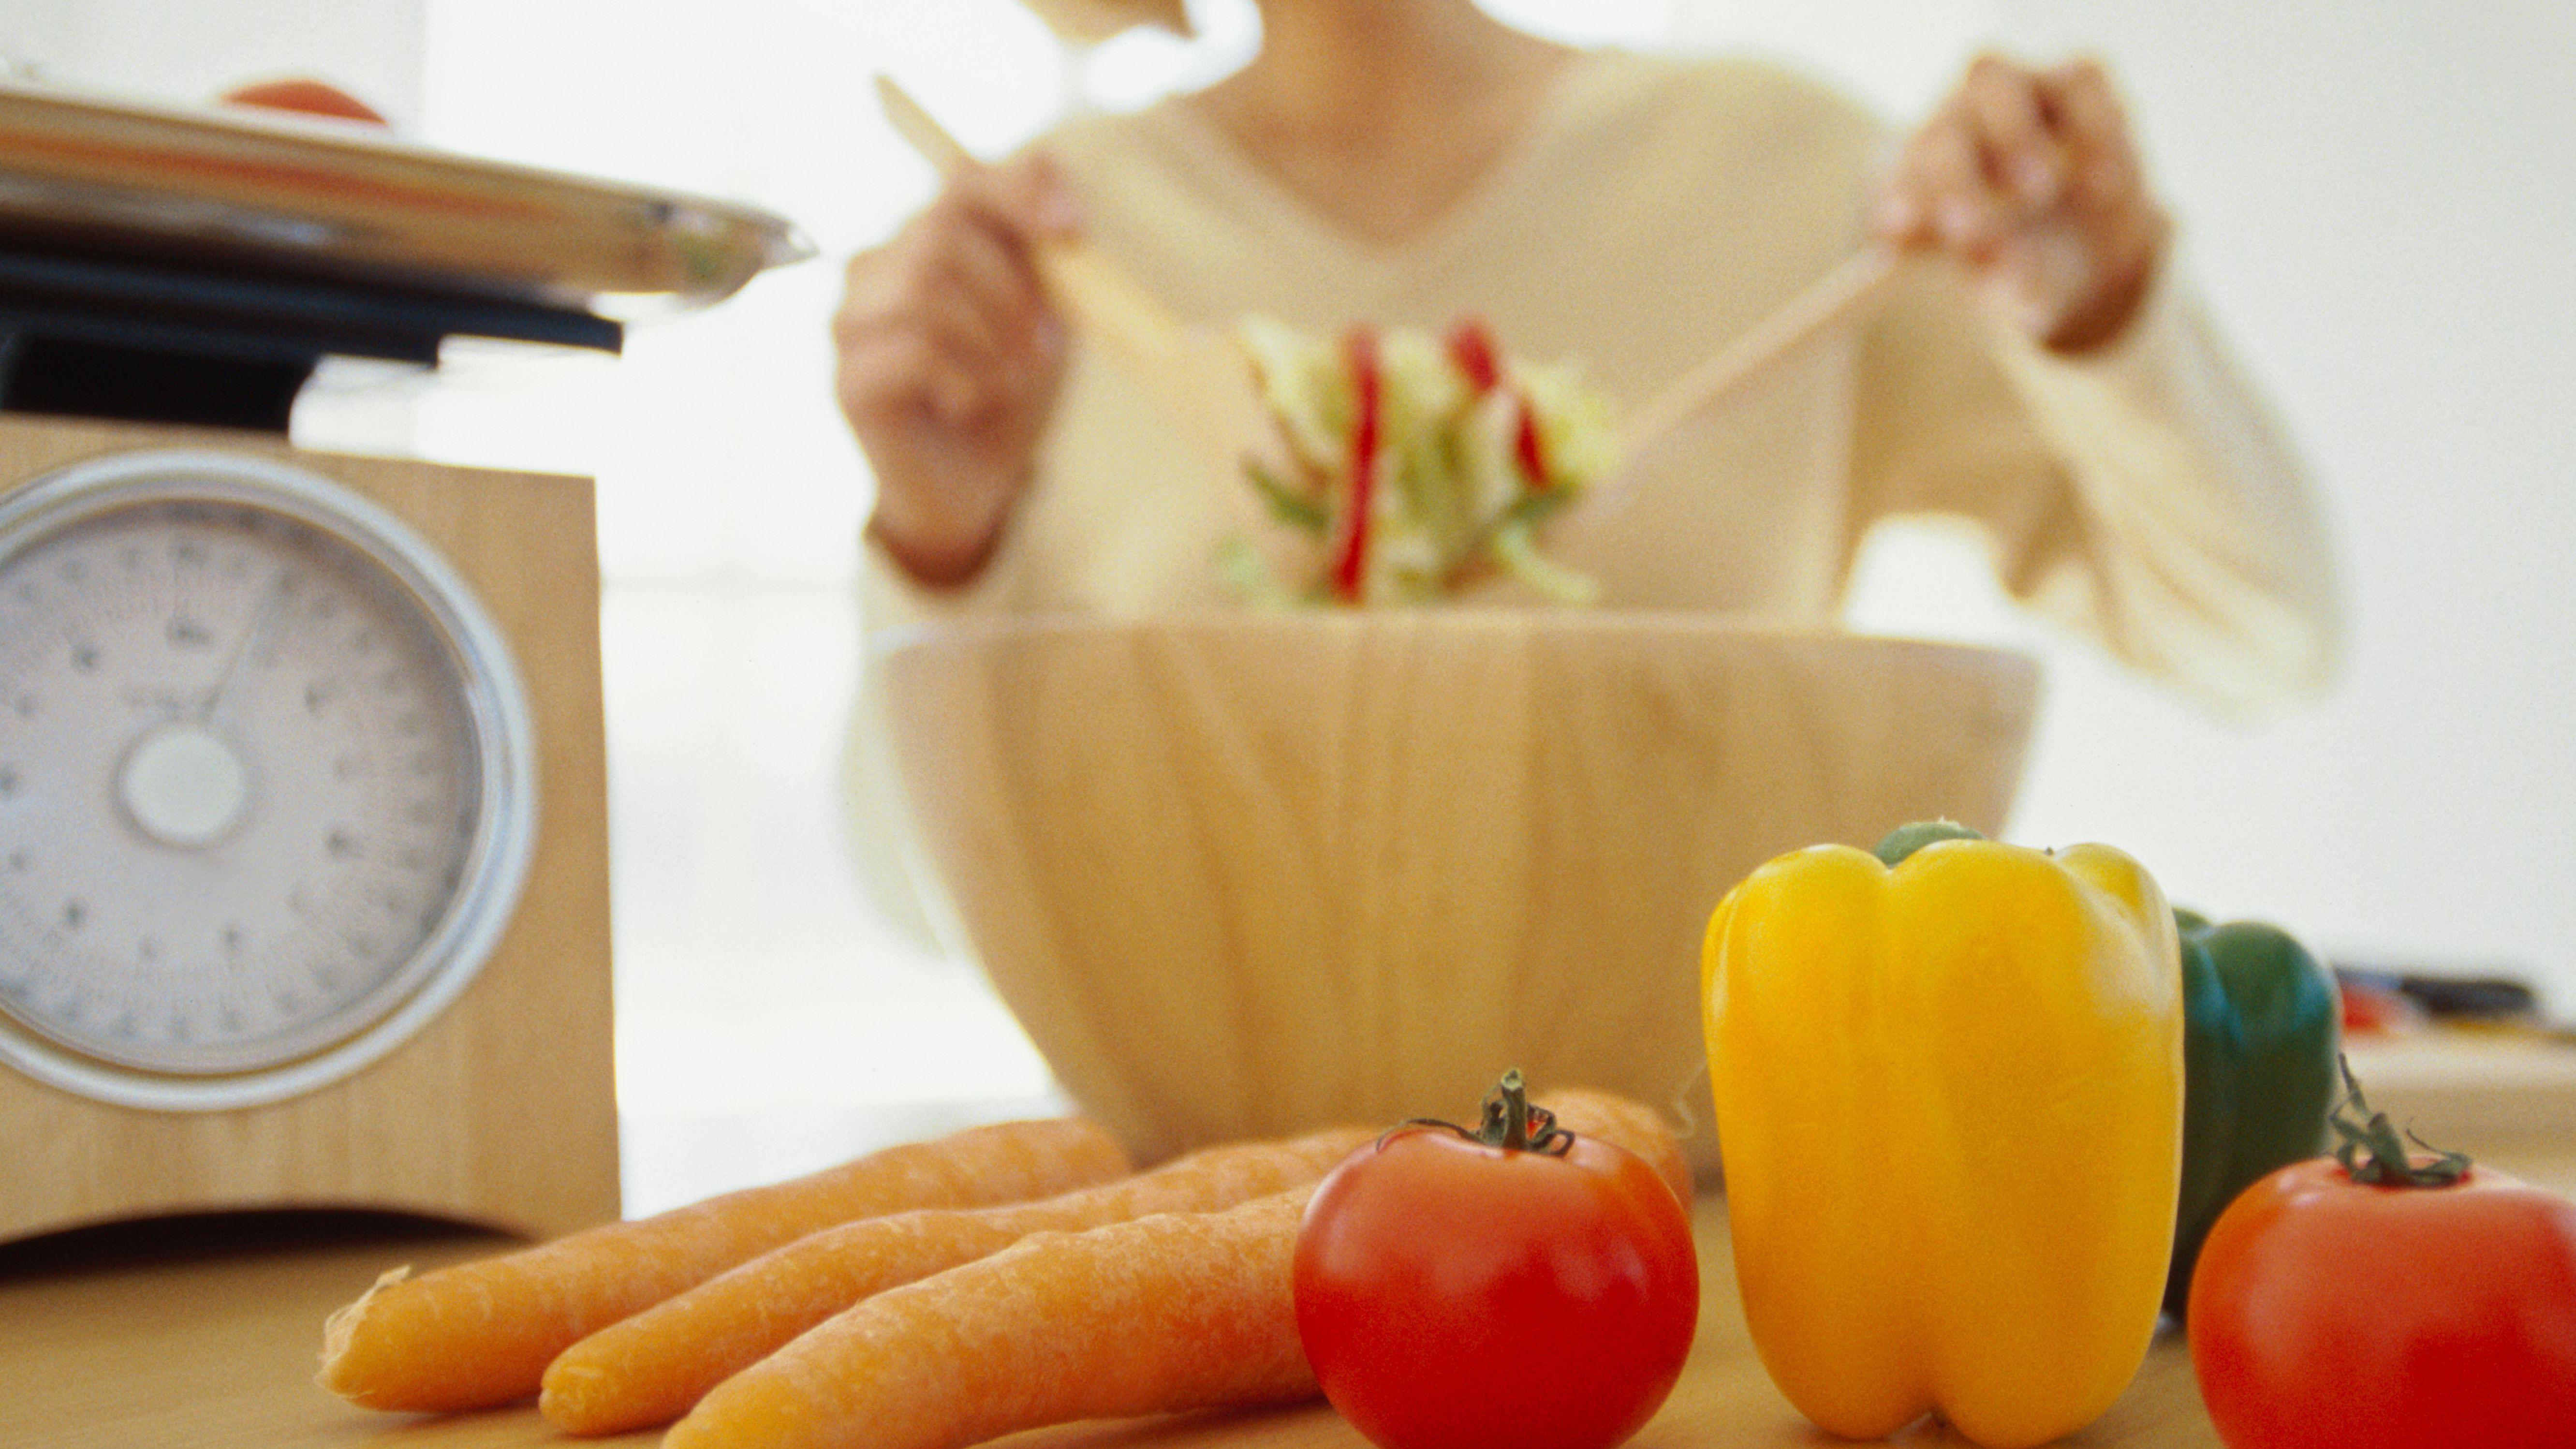 Sample Menus For A 1 700 Calorie Diet